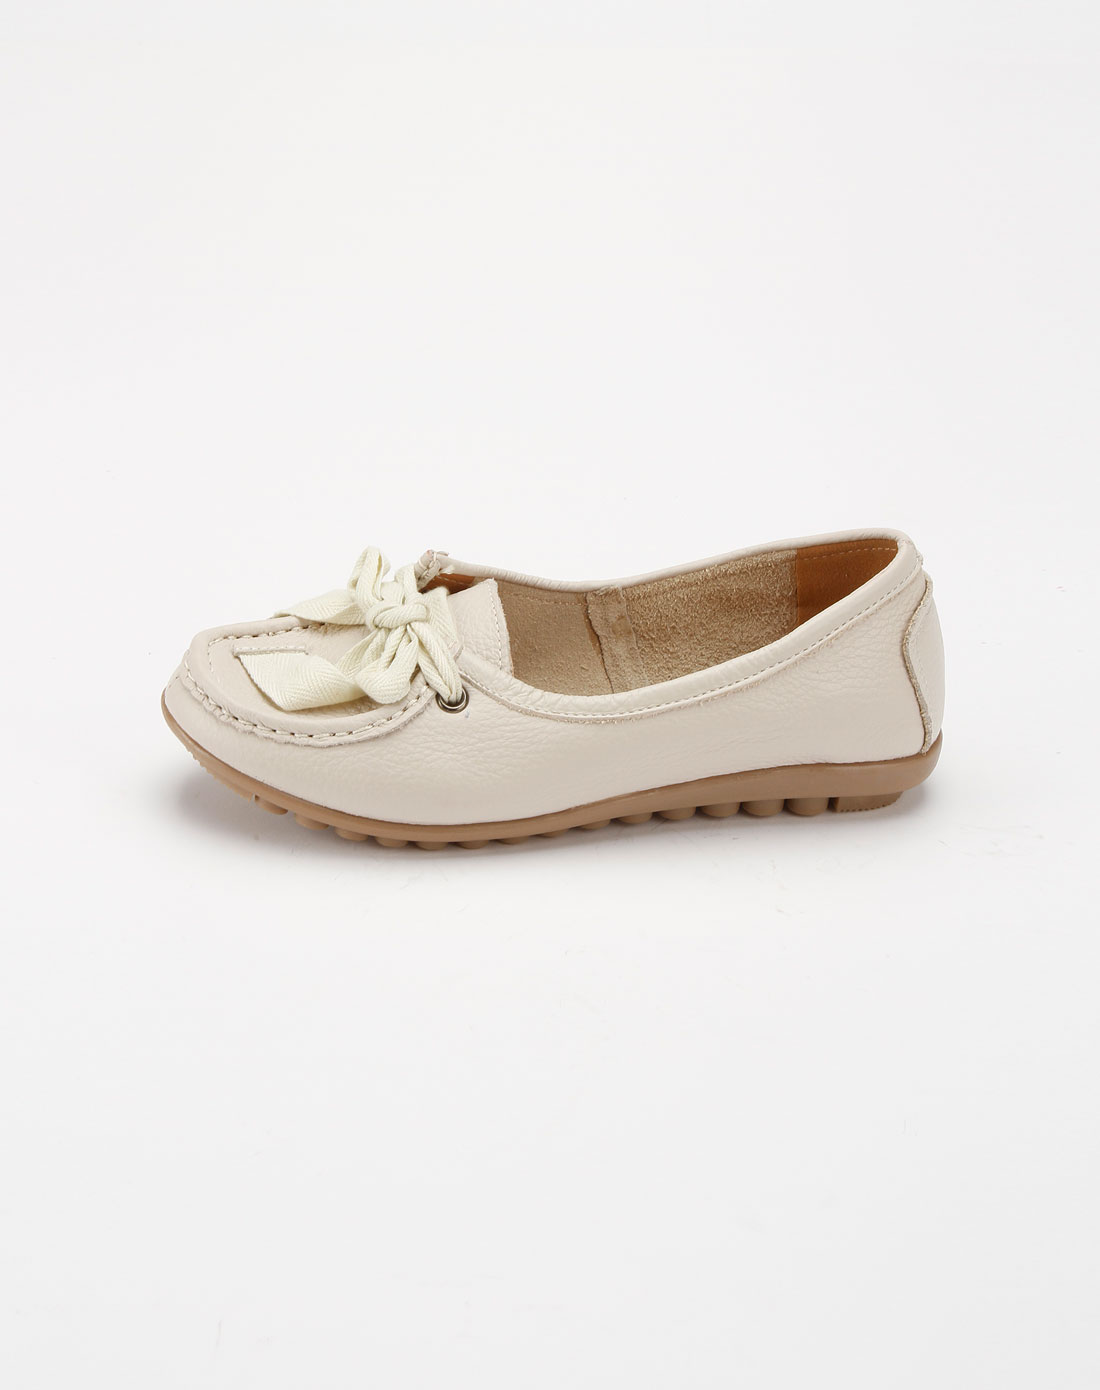 fasoli米色舒适休闲鞋101-米色